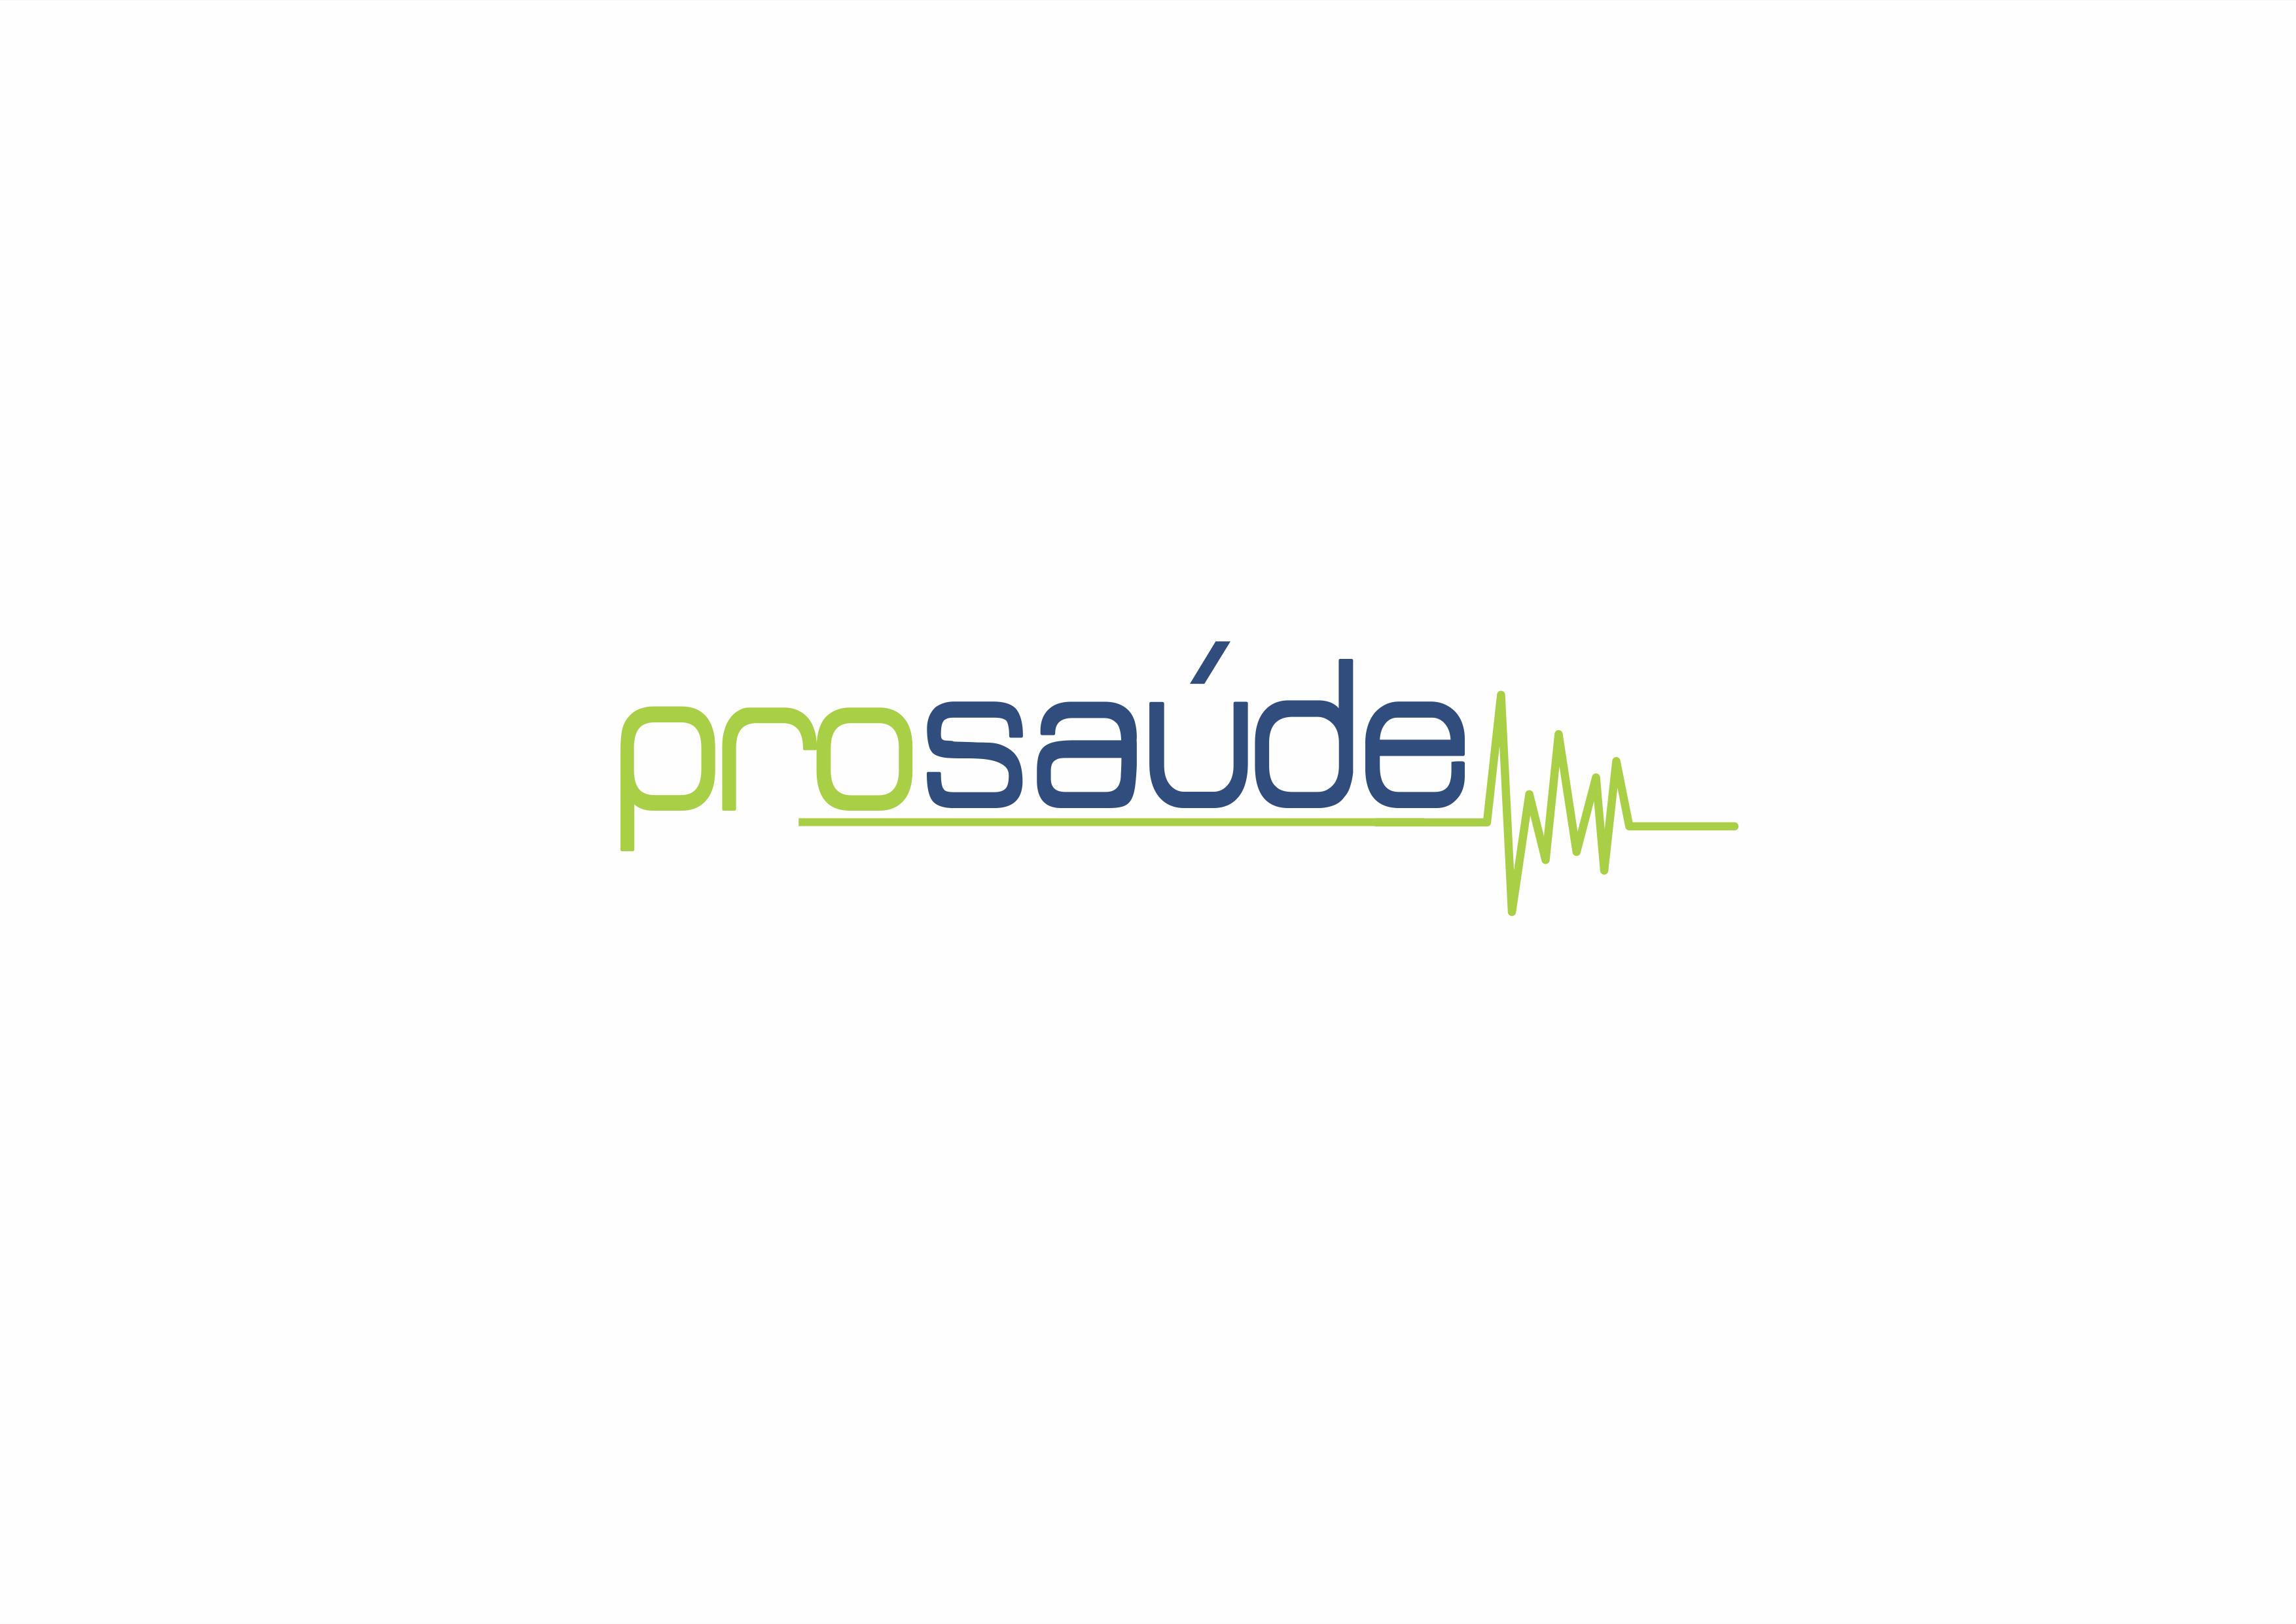 logomarca pro saude